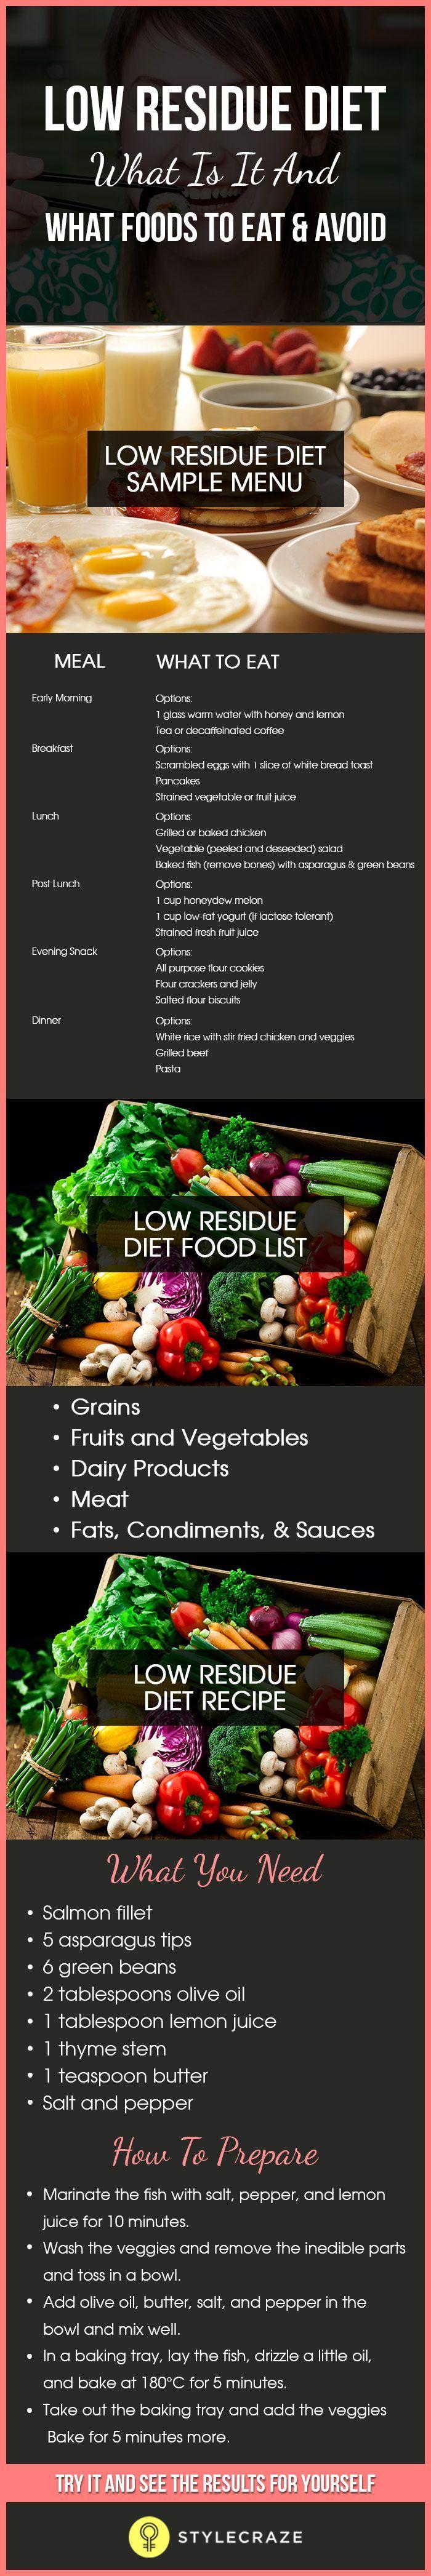 Liraglutide weight loss study